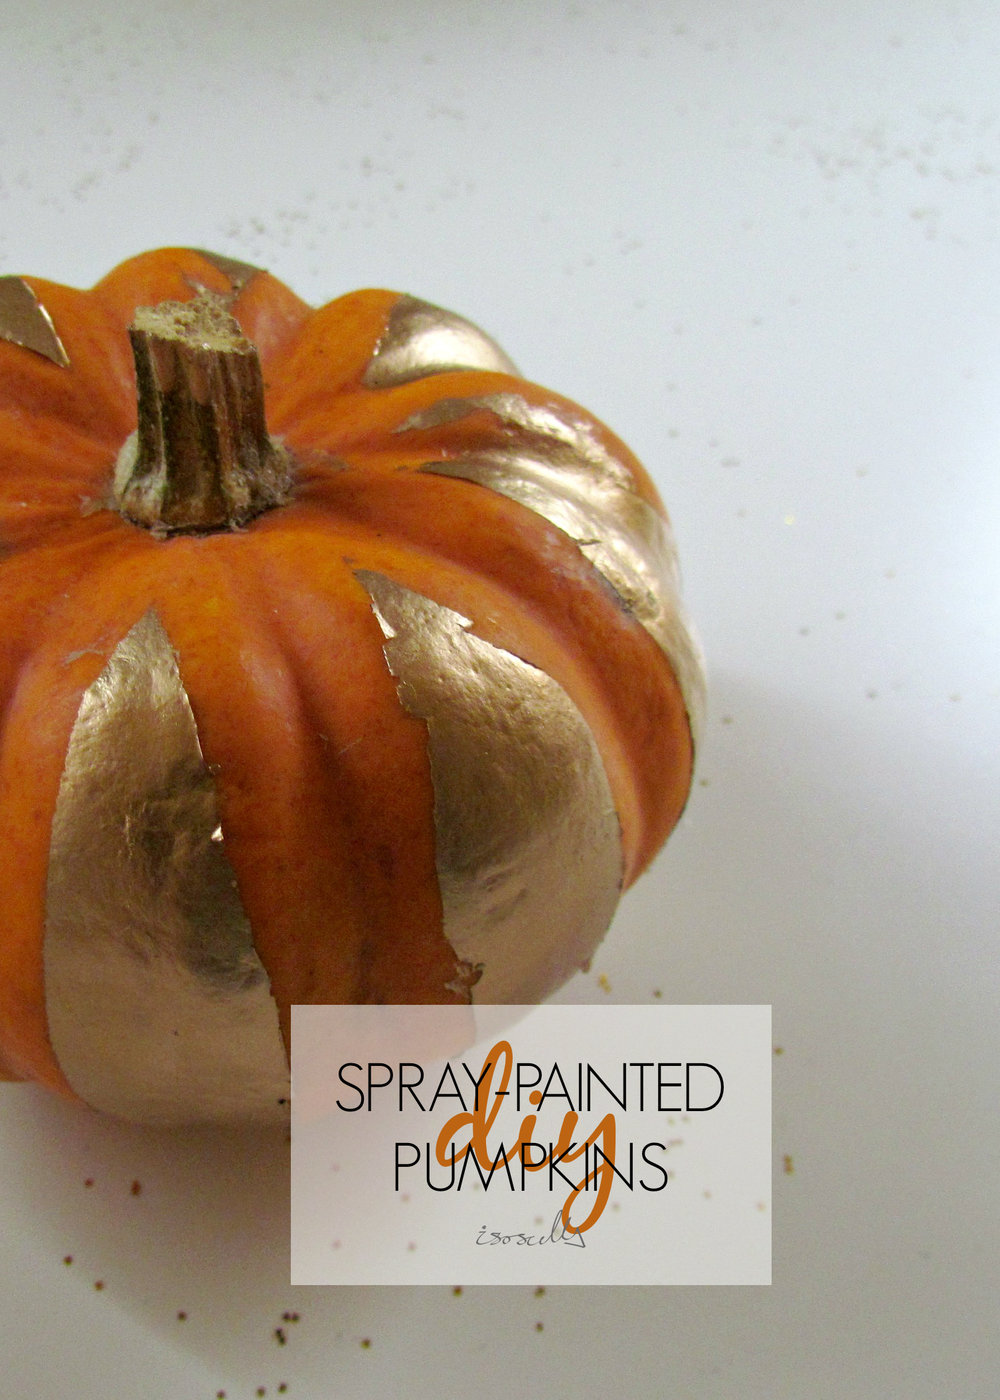 DIY Spray-Painted Pumpkins by Isoscella